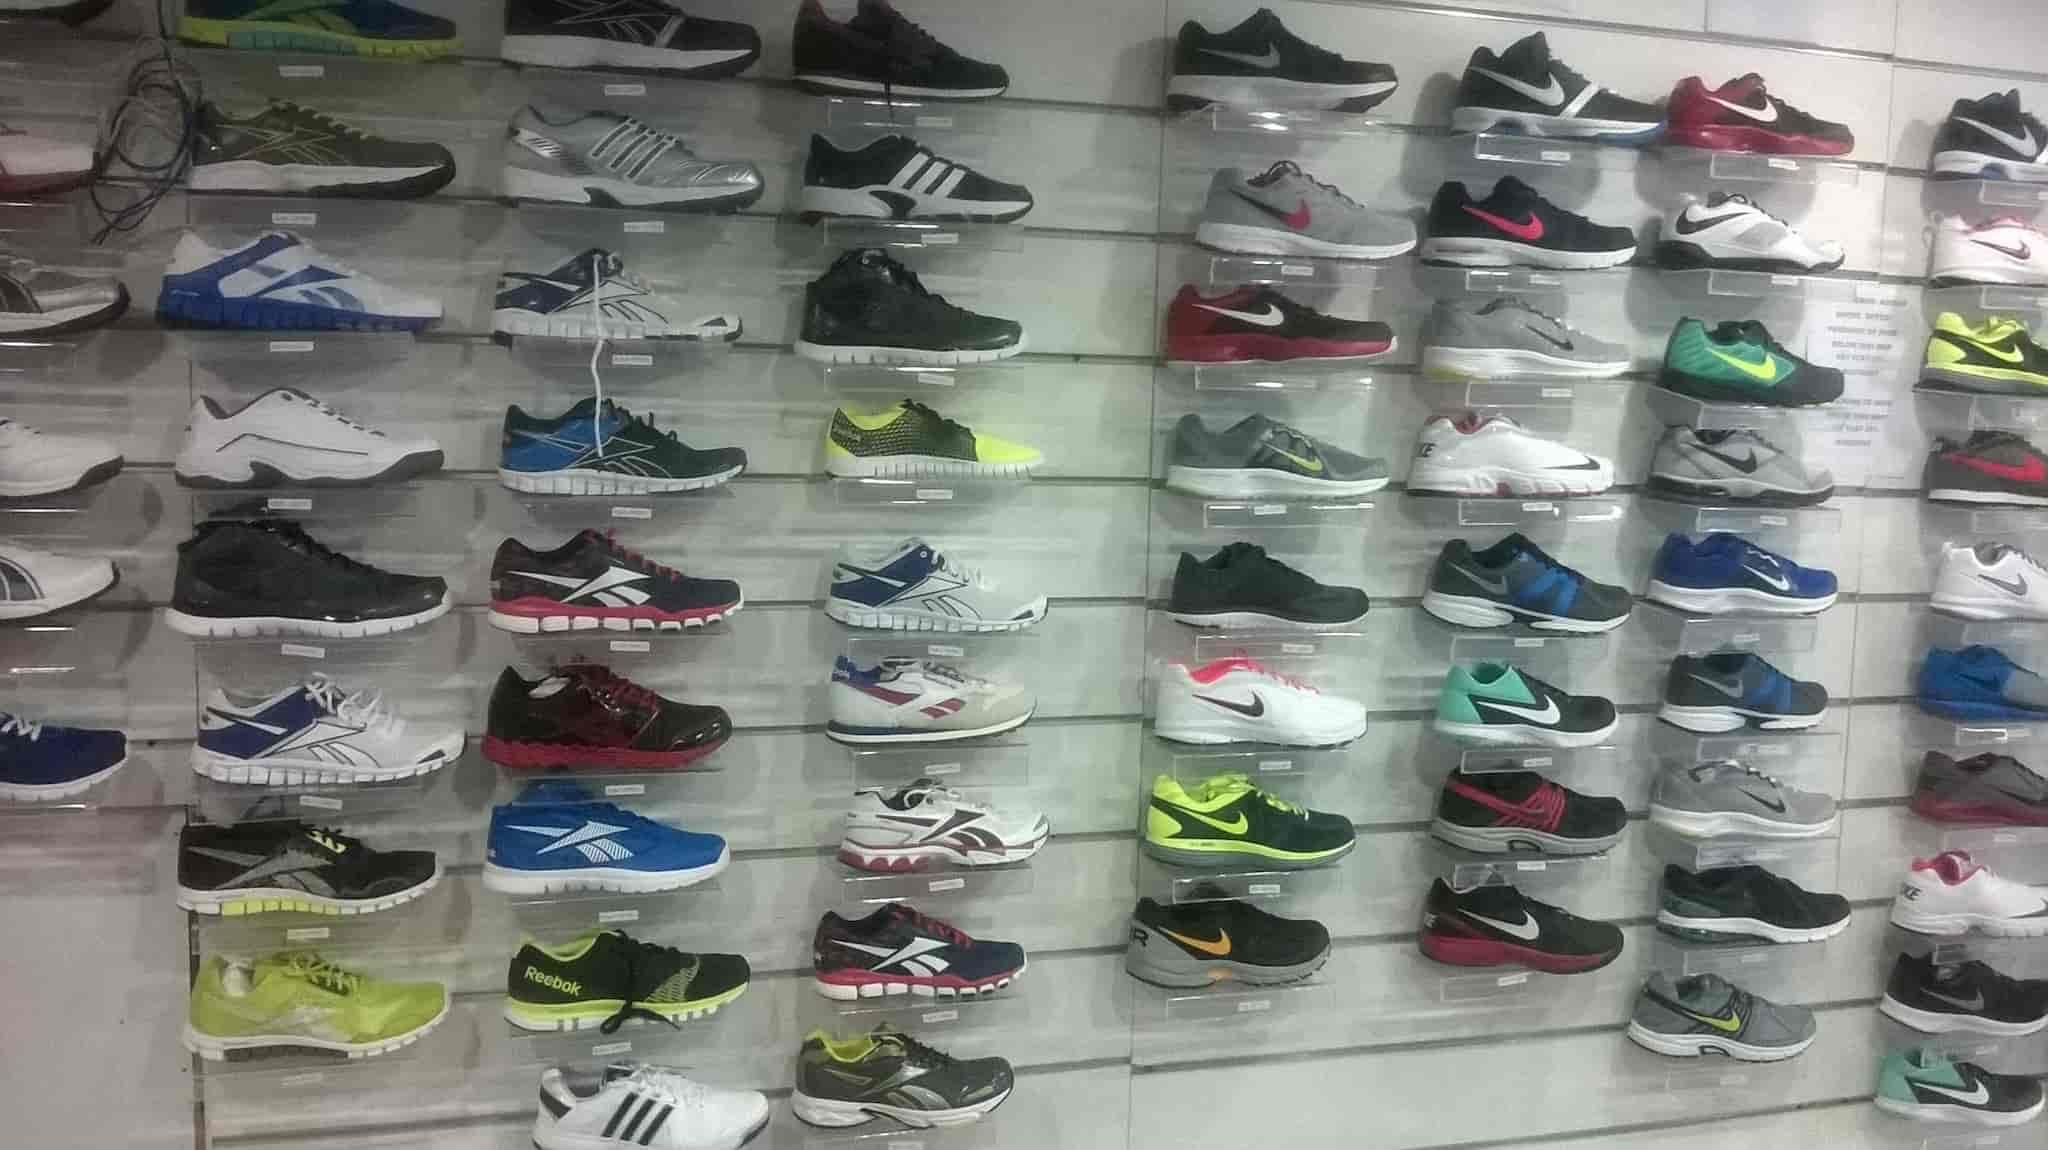 Top Reebok Shoe Dealers in Anna Nagar